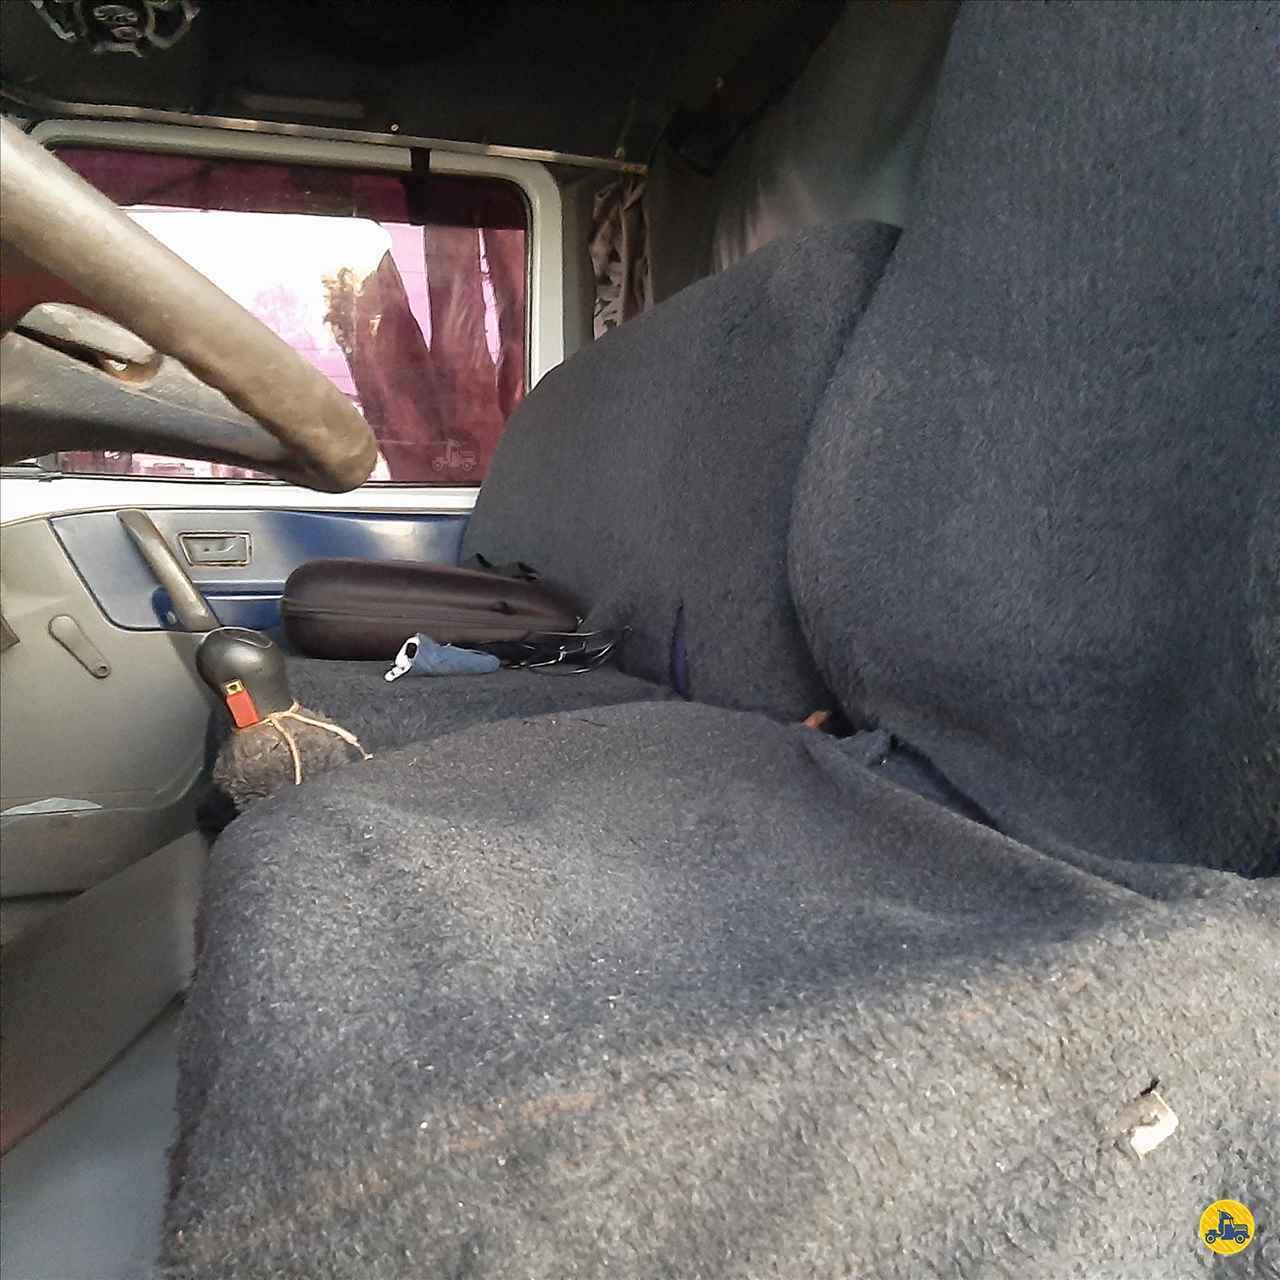 VOLKSWAGEN VW 17220  2005/2005 Megatruck Caminhões e Máquinas